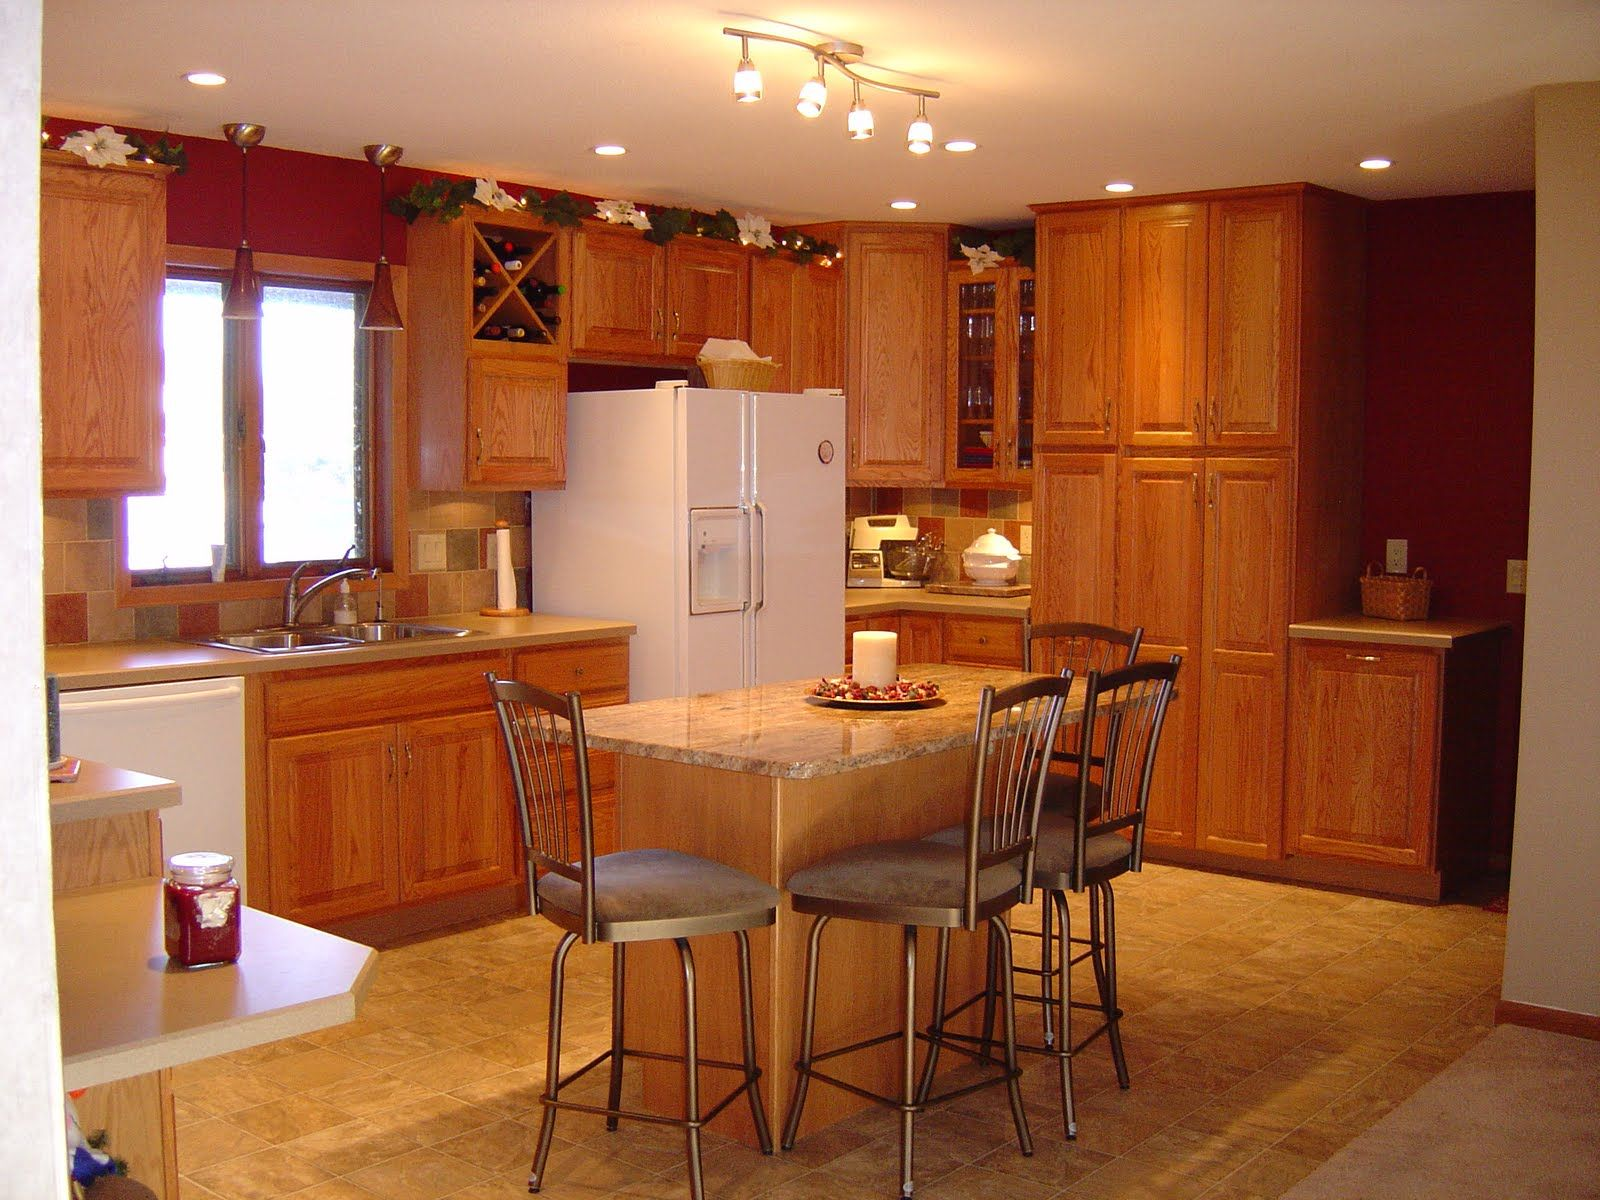 Oak Cabinets  Chi Cabinets Oak Cabinetrykraftmaid Cabinets Fair Hardware Kitchen Cabinets 2018